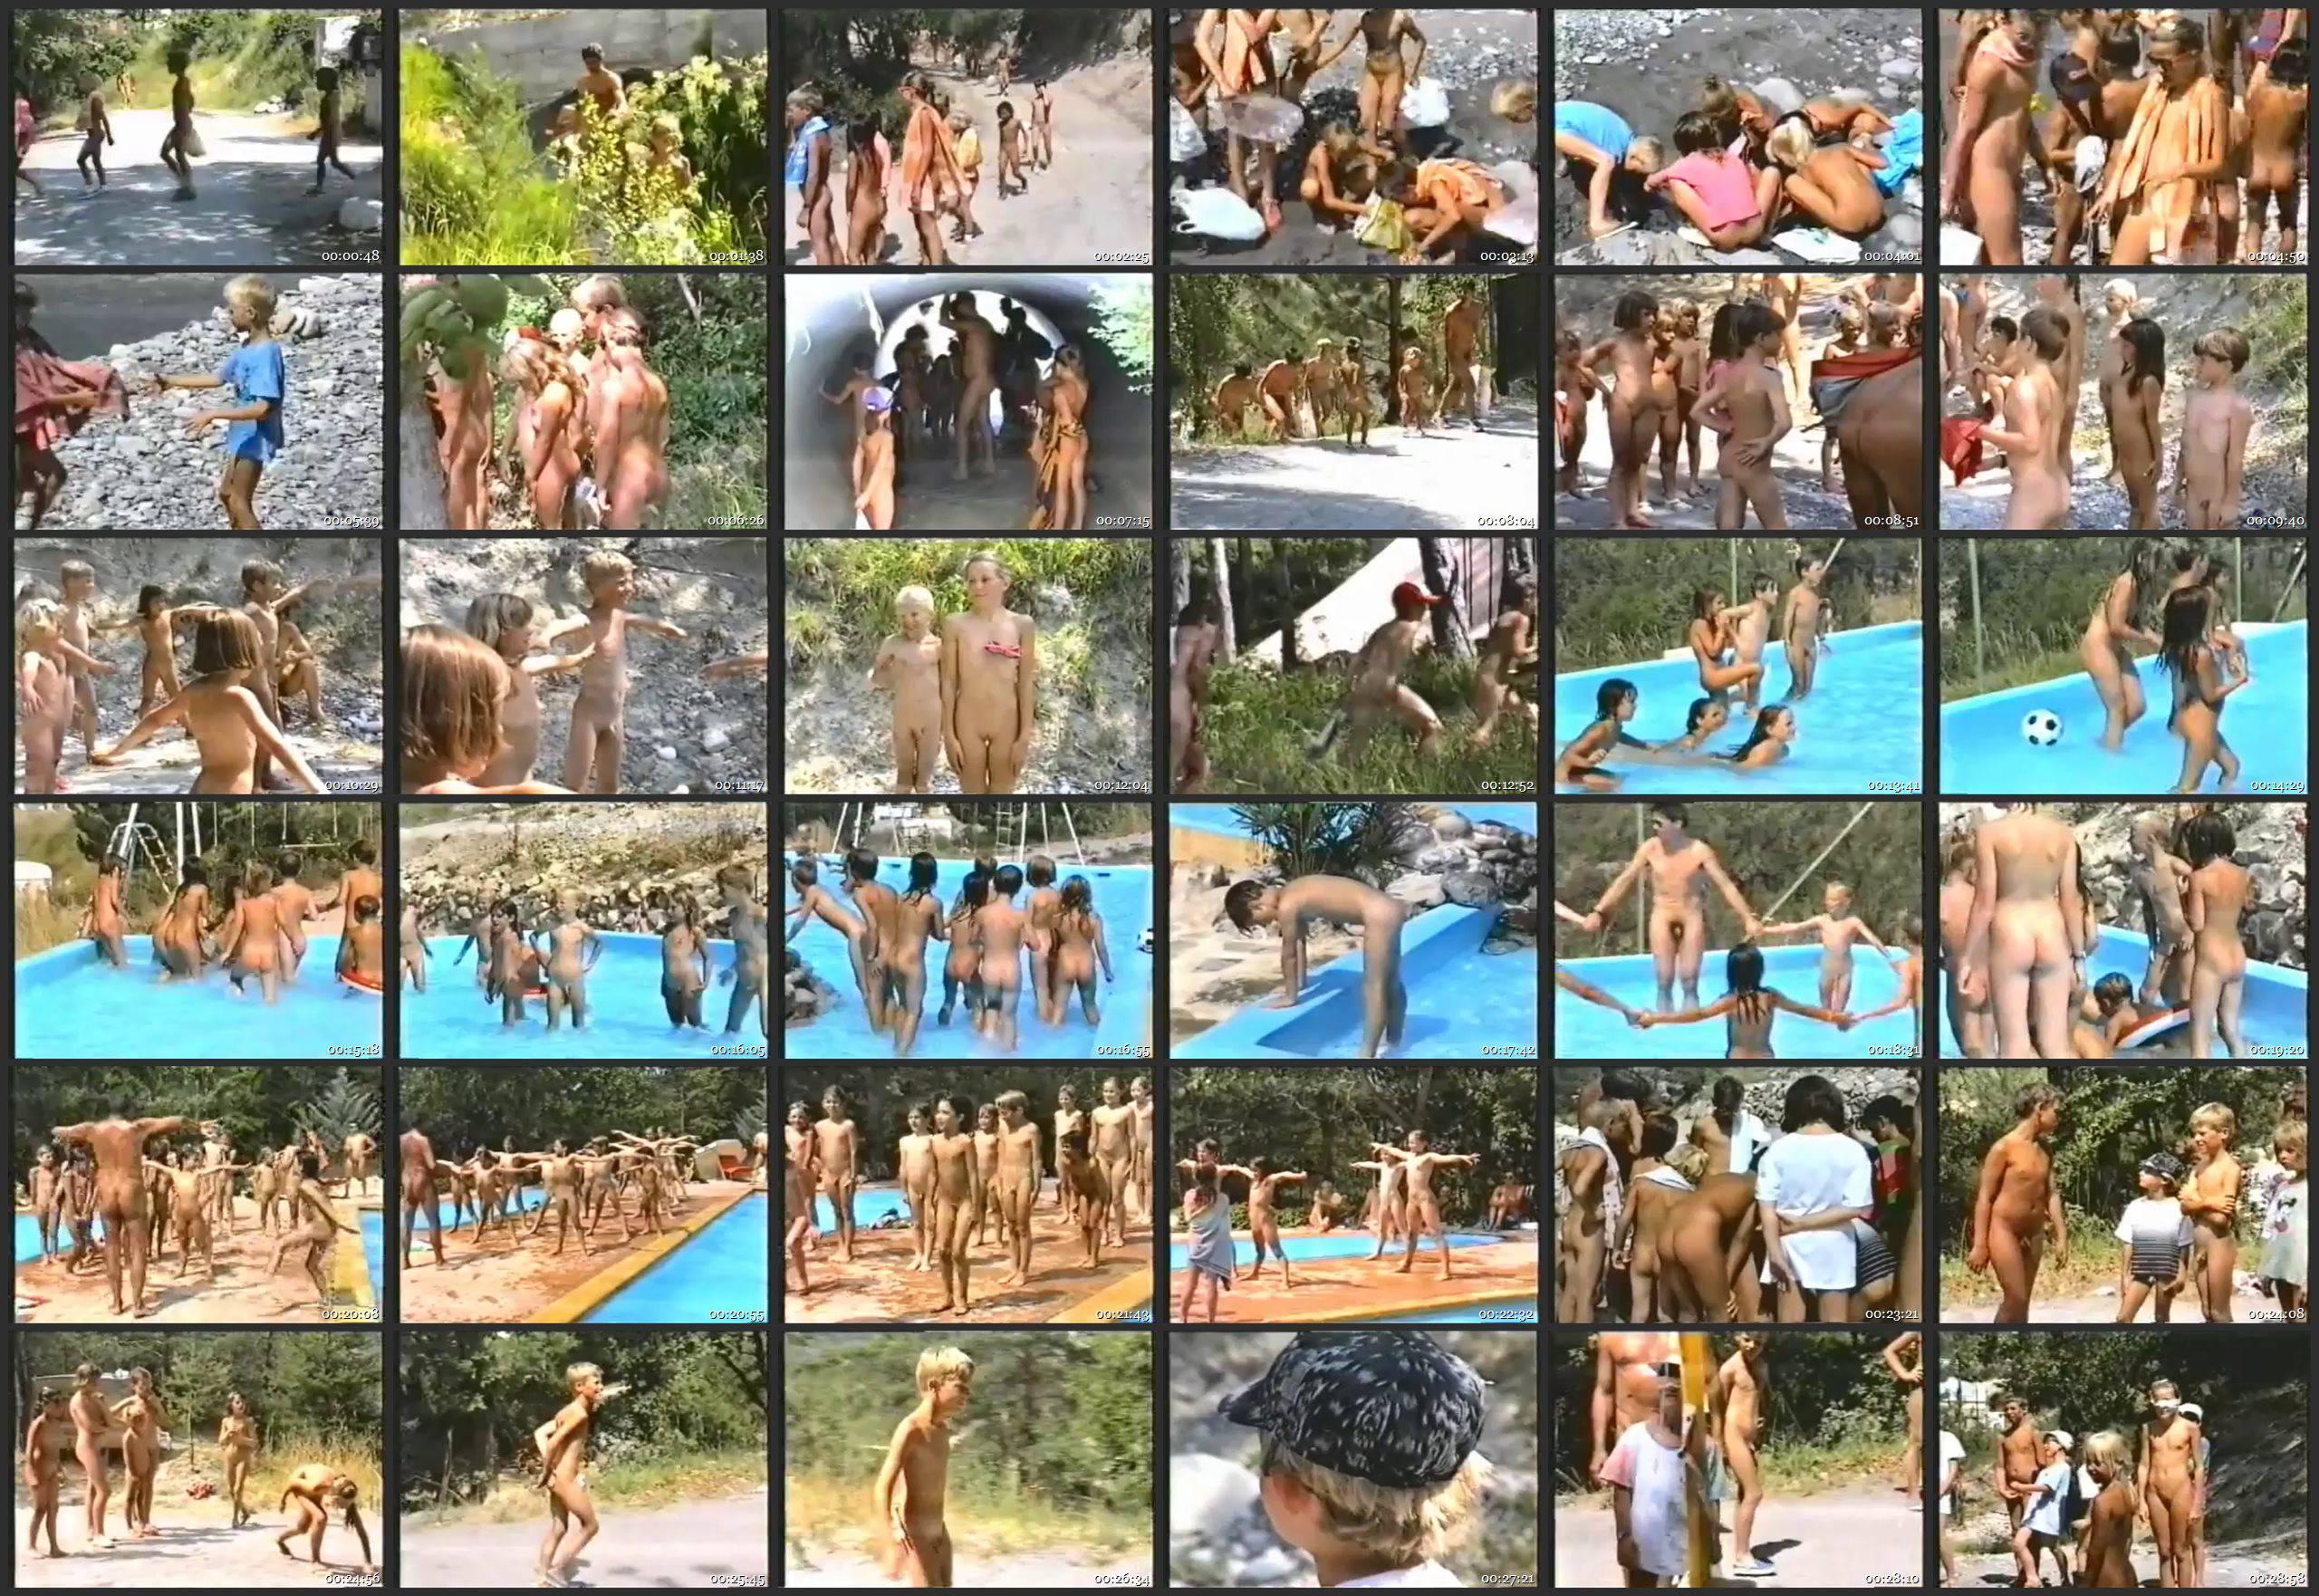 FKK Videos-Summer Fun and Games - Thumbnails